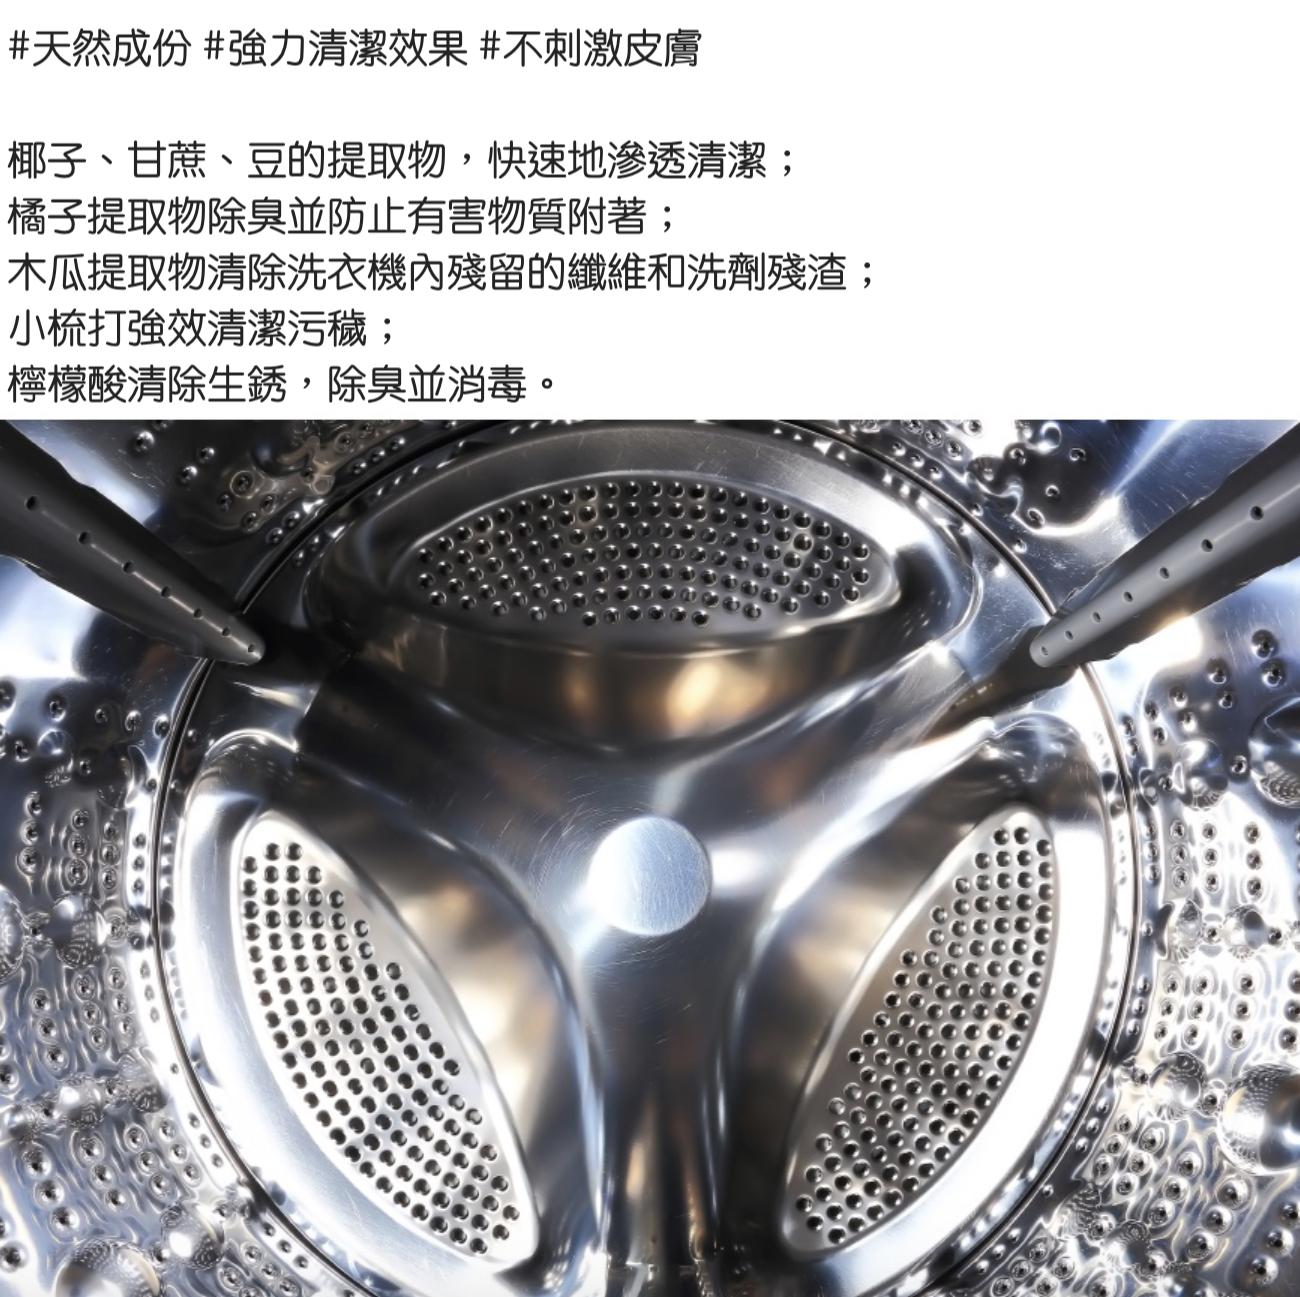 [shiPAPA] 洗衣機清潔劑 3包入|韓國直送|香港 澳門